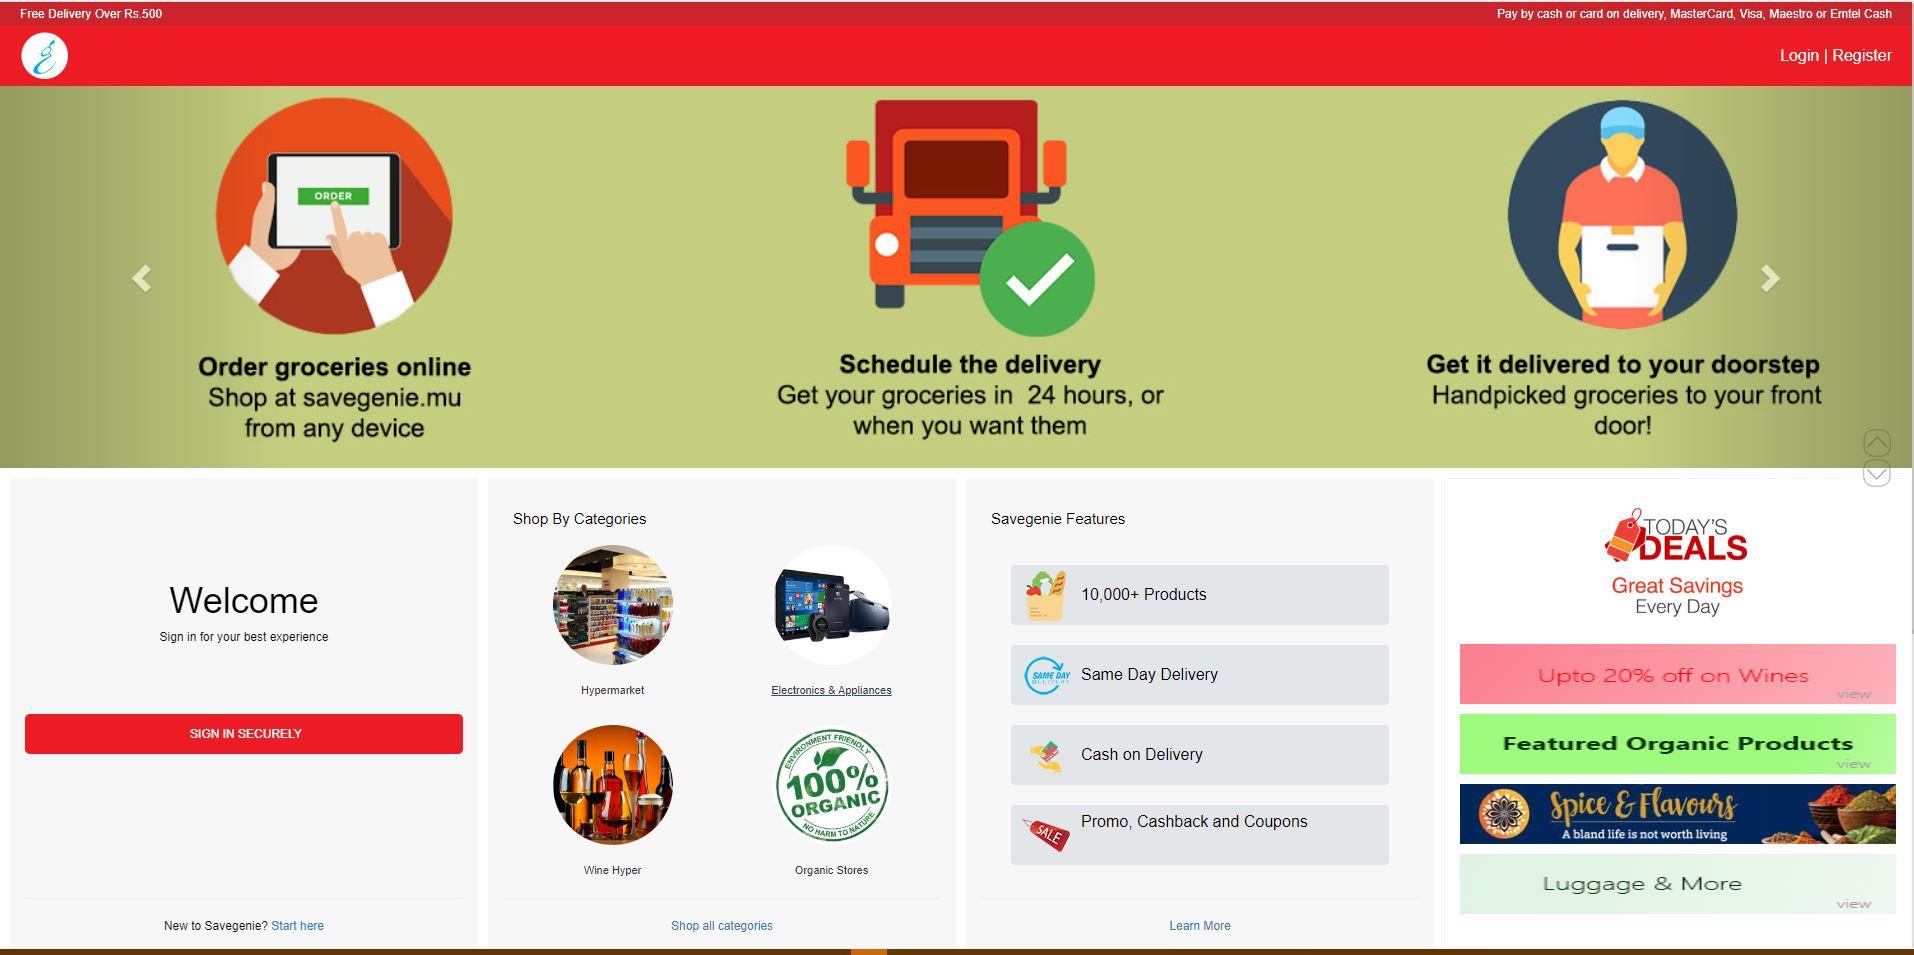 Savegenie-Digital-Marketing-Mauritius-E-commerce